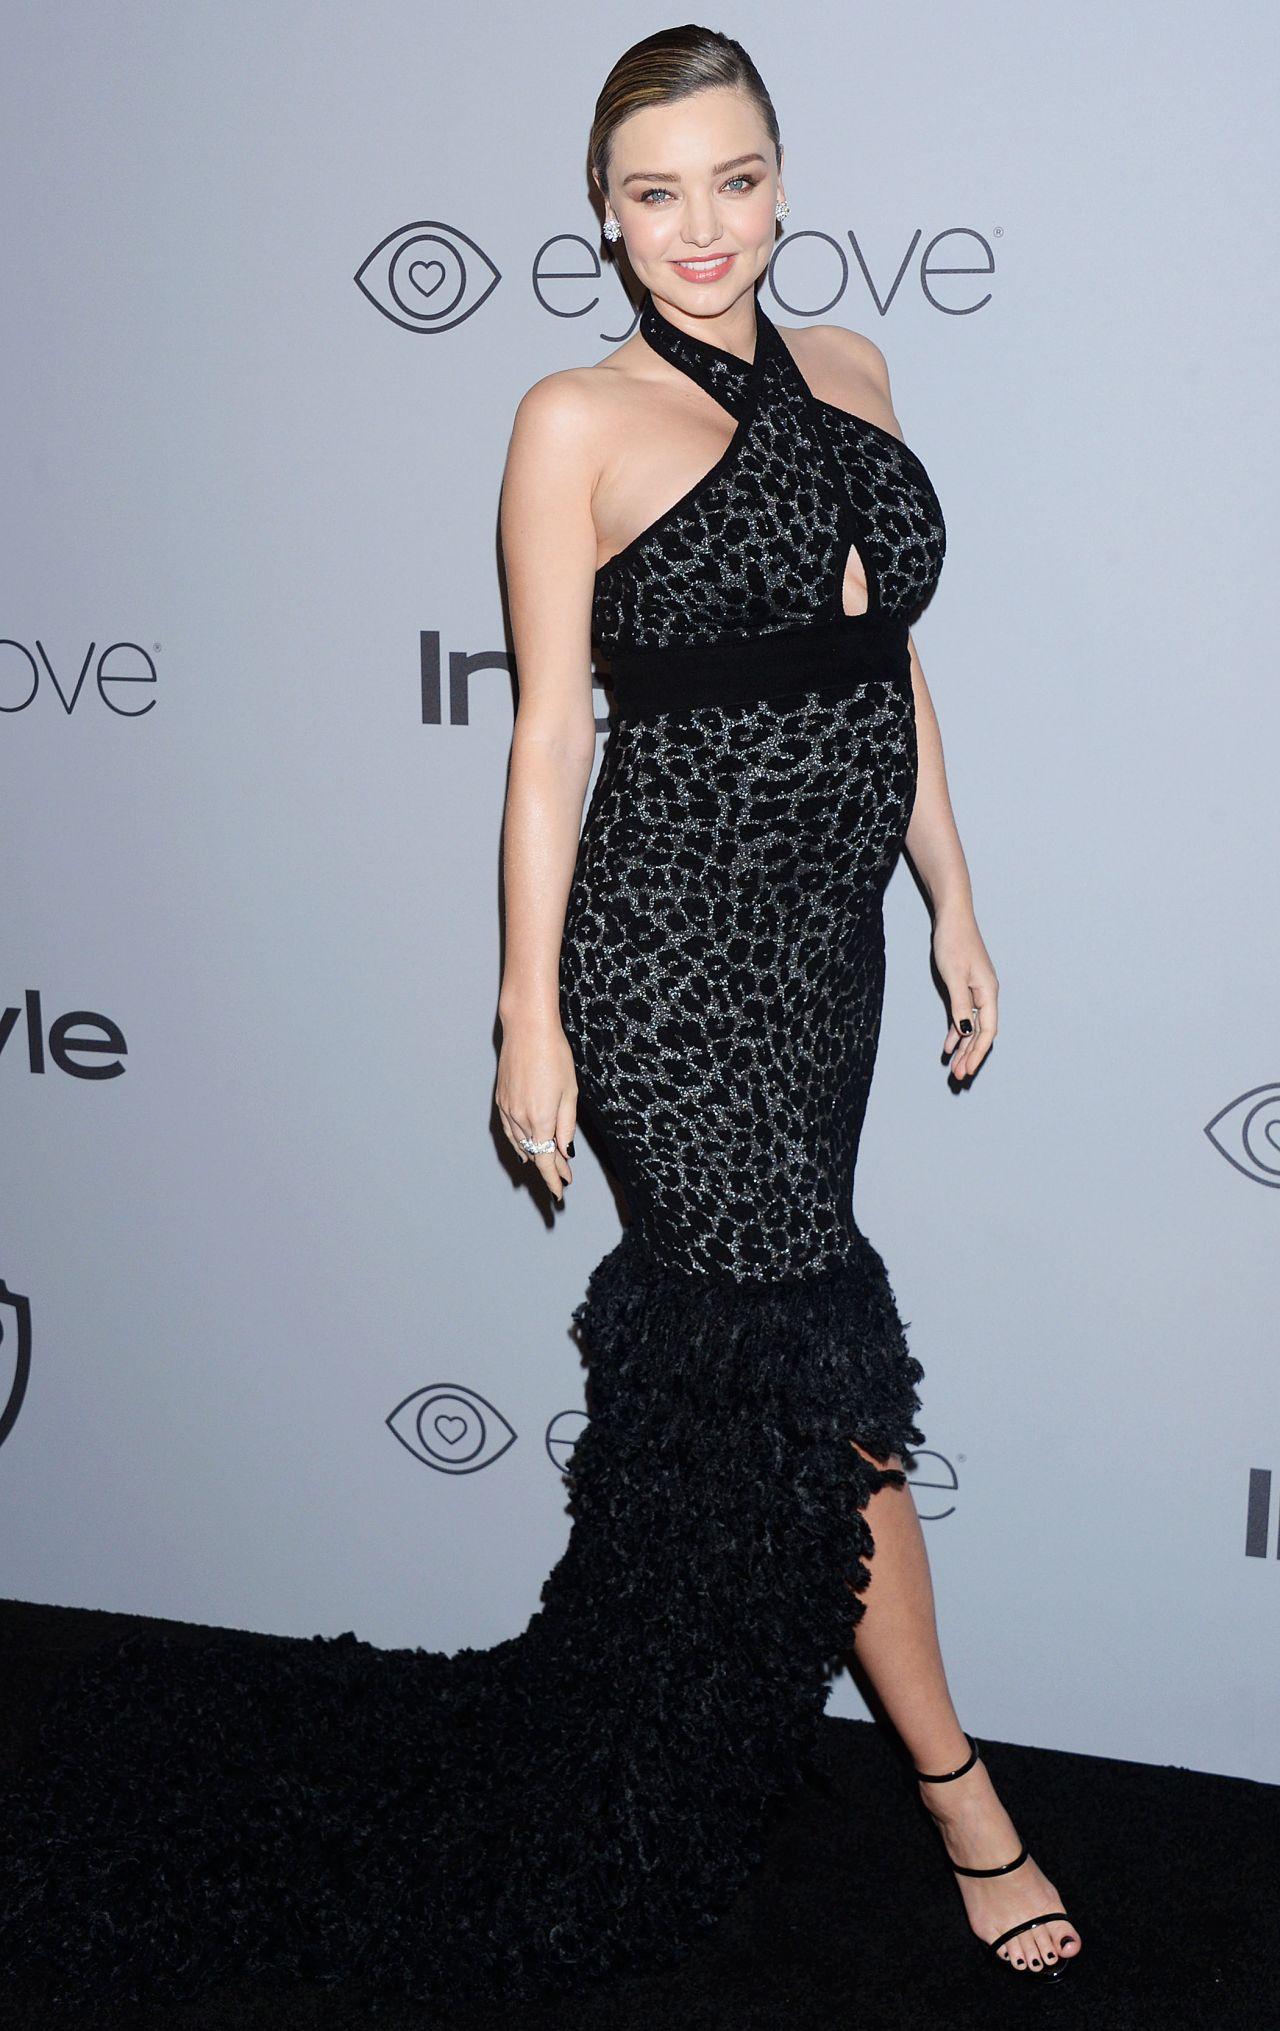 Miranda Kerr Latest Photos - CelebMafia Miranda Kerr